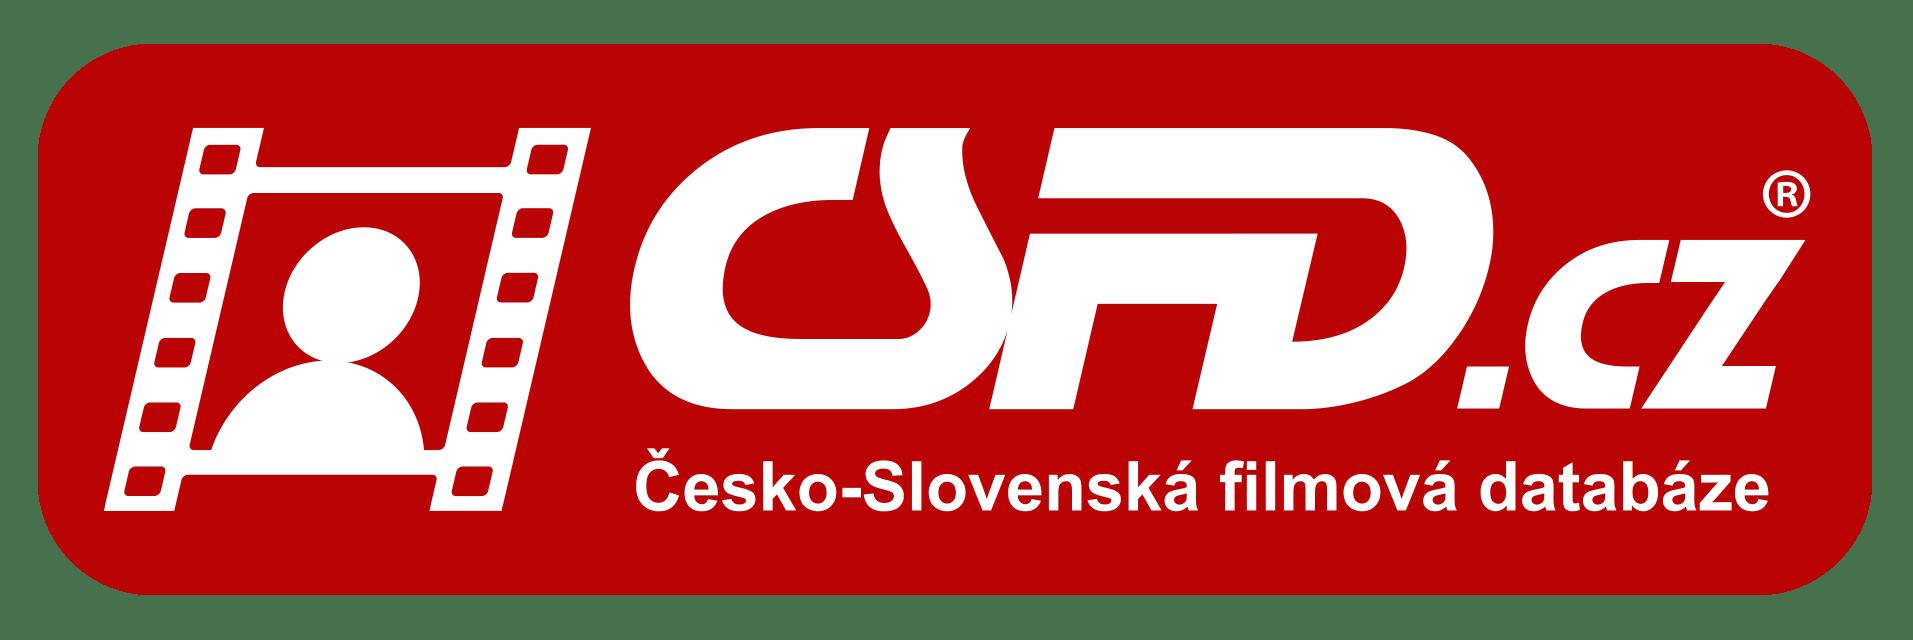 logo-white-red